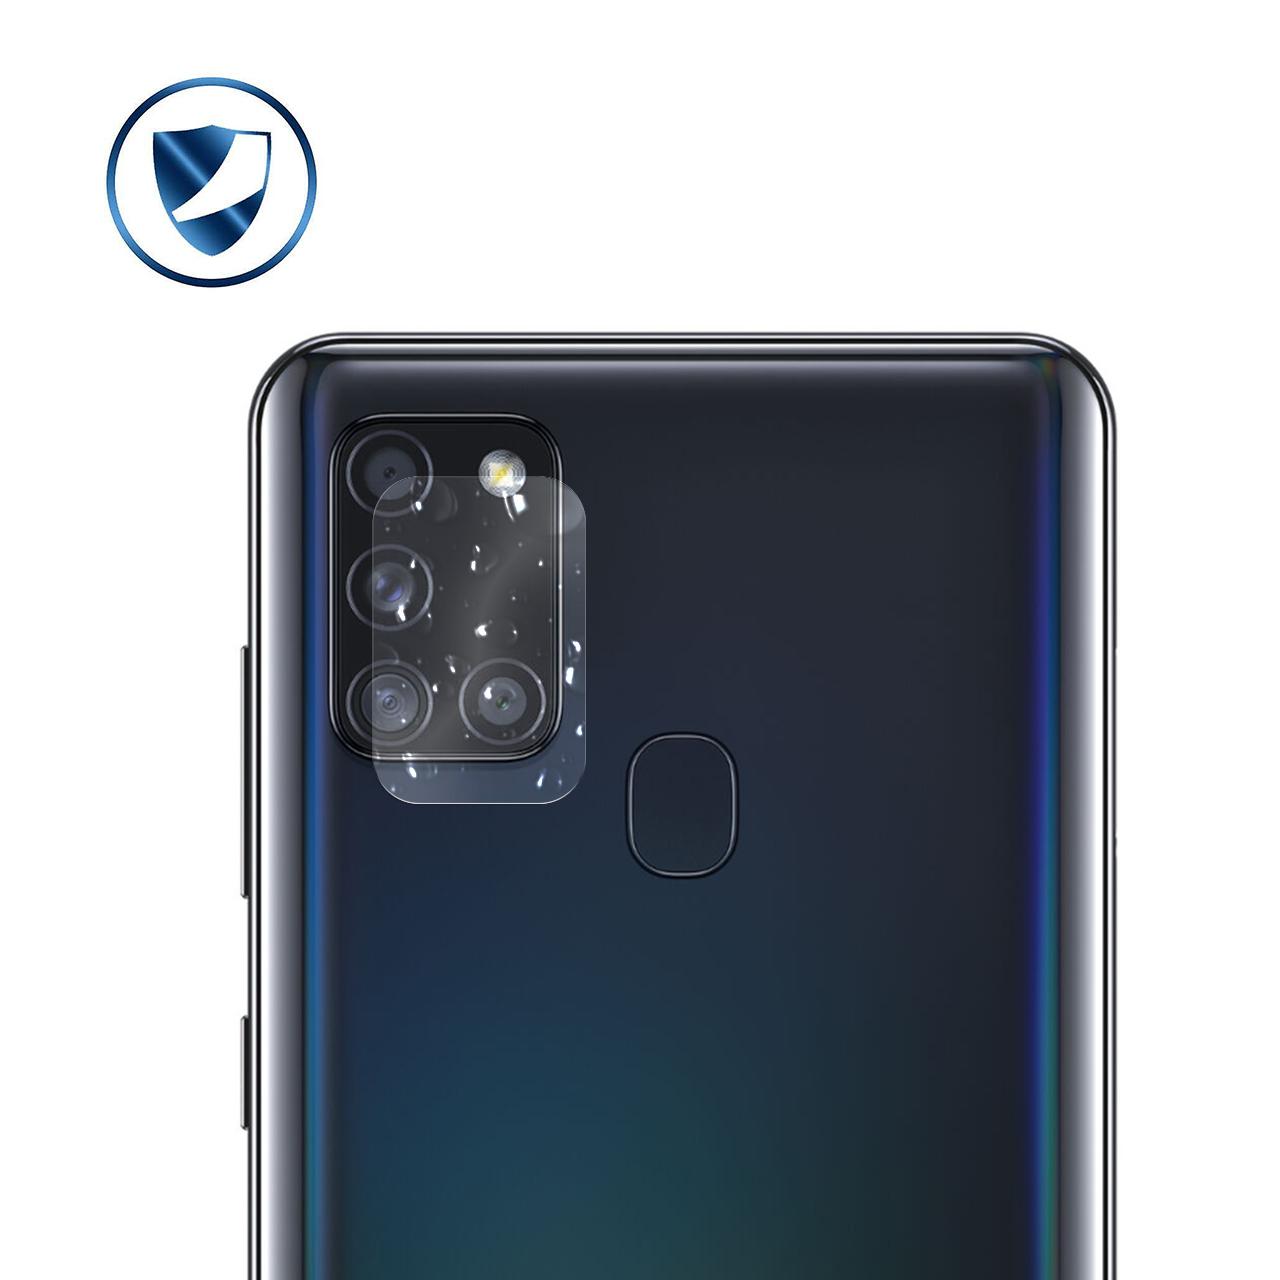 محافظ لنز دوربین سیحان مدل GLP مناسب برای گوشی موبایل سامسونگ Galaxy A21s main 1 3